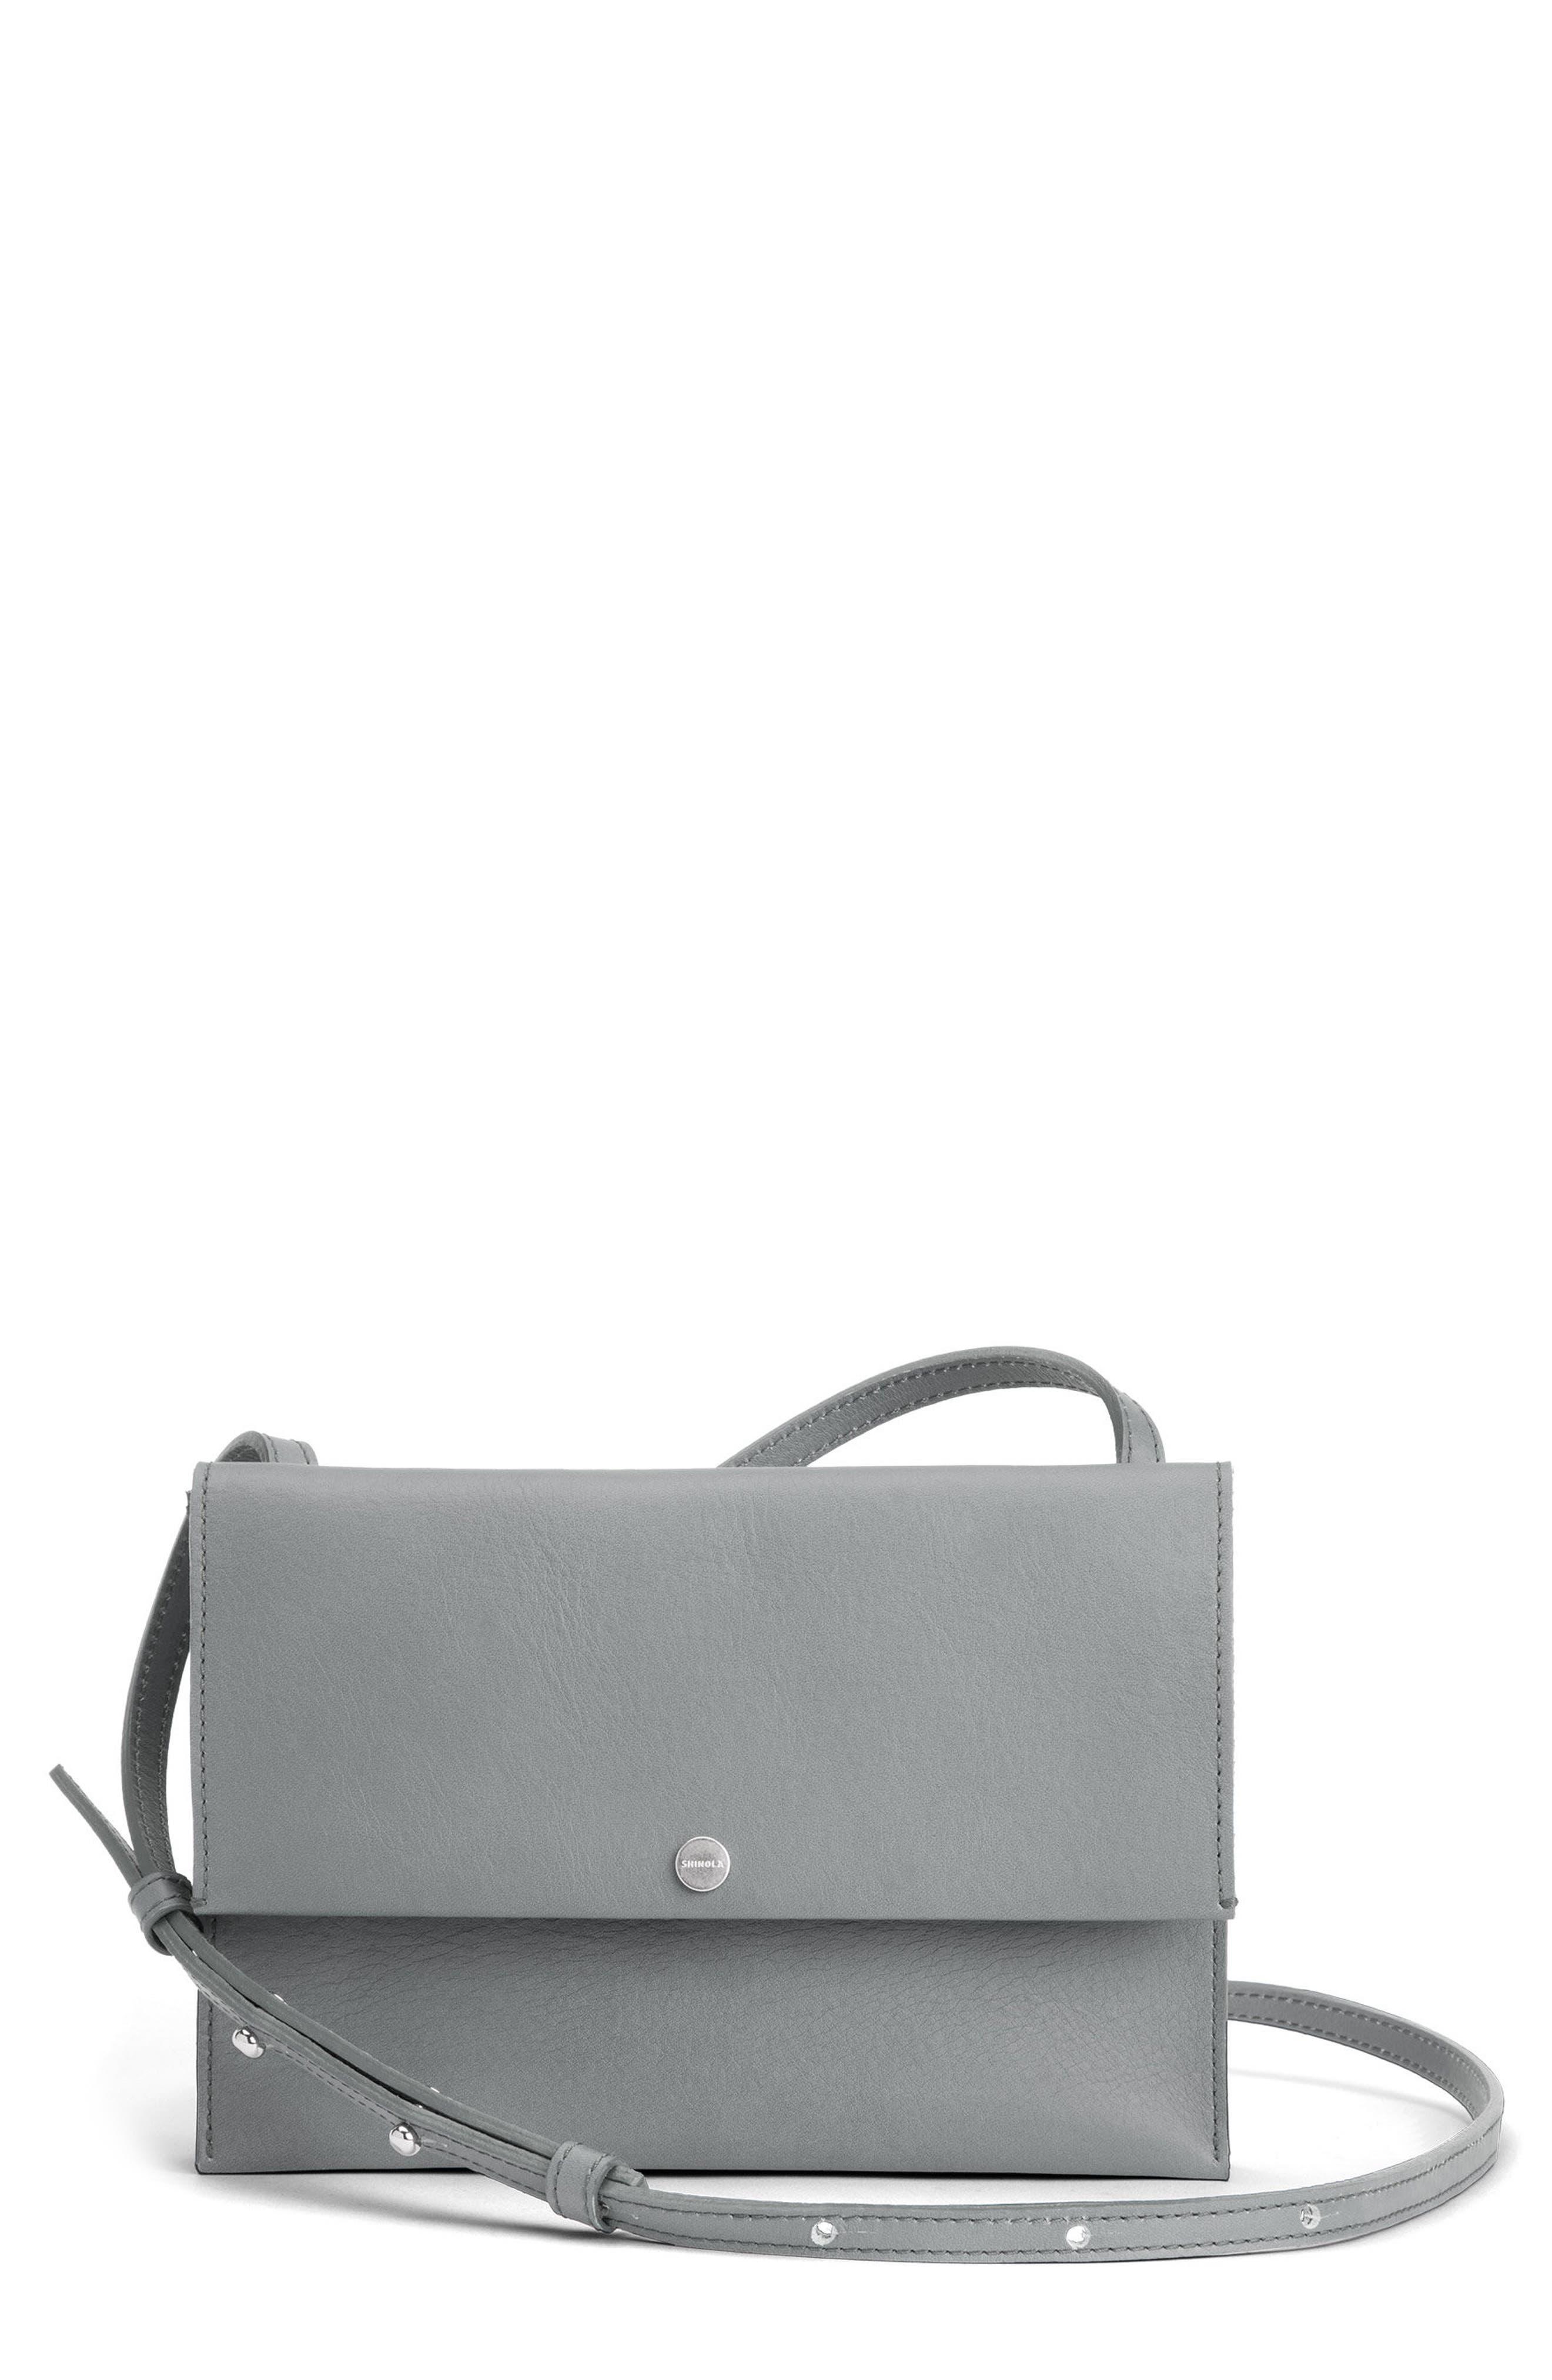 Crossbody Leather Bag,                             Main thumbnail 1, color,                             Cool Grey